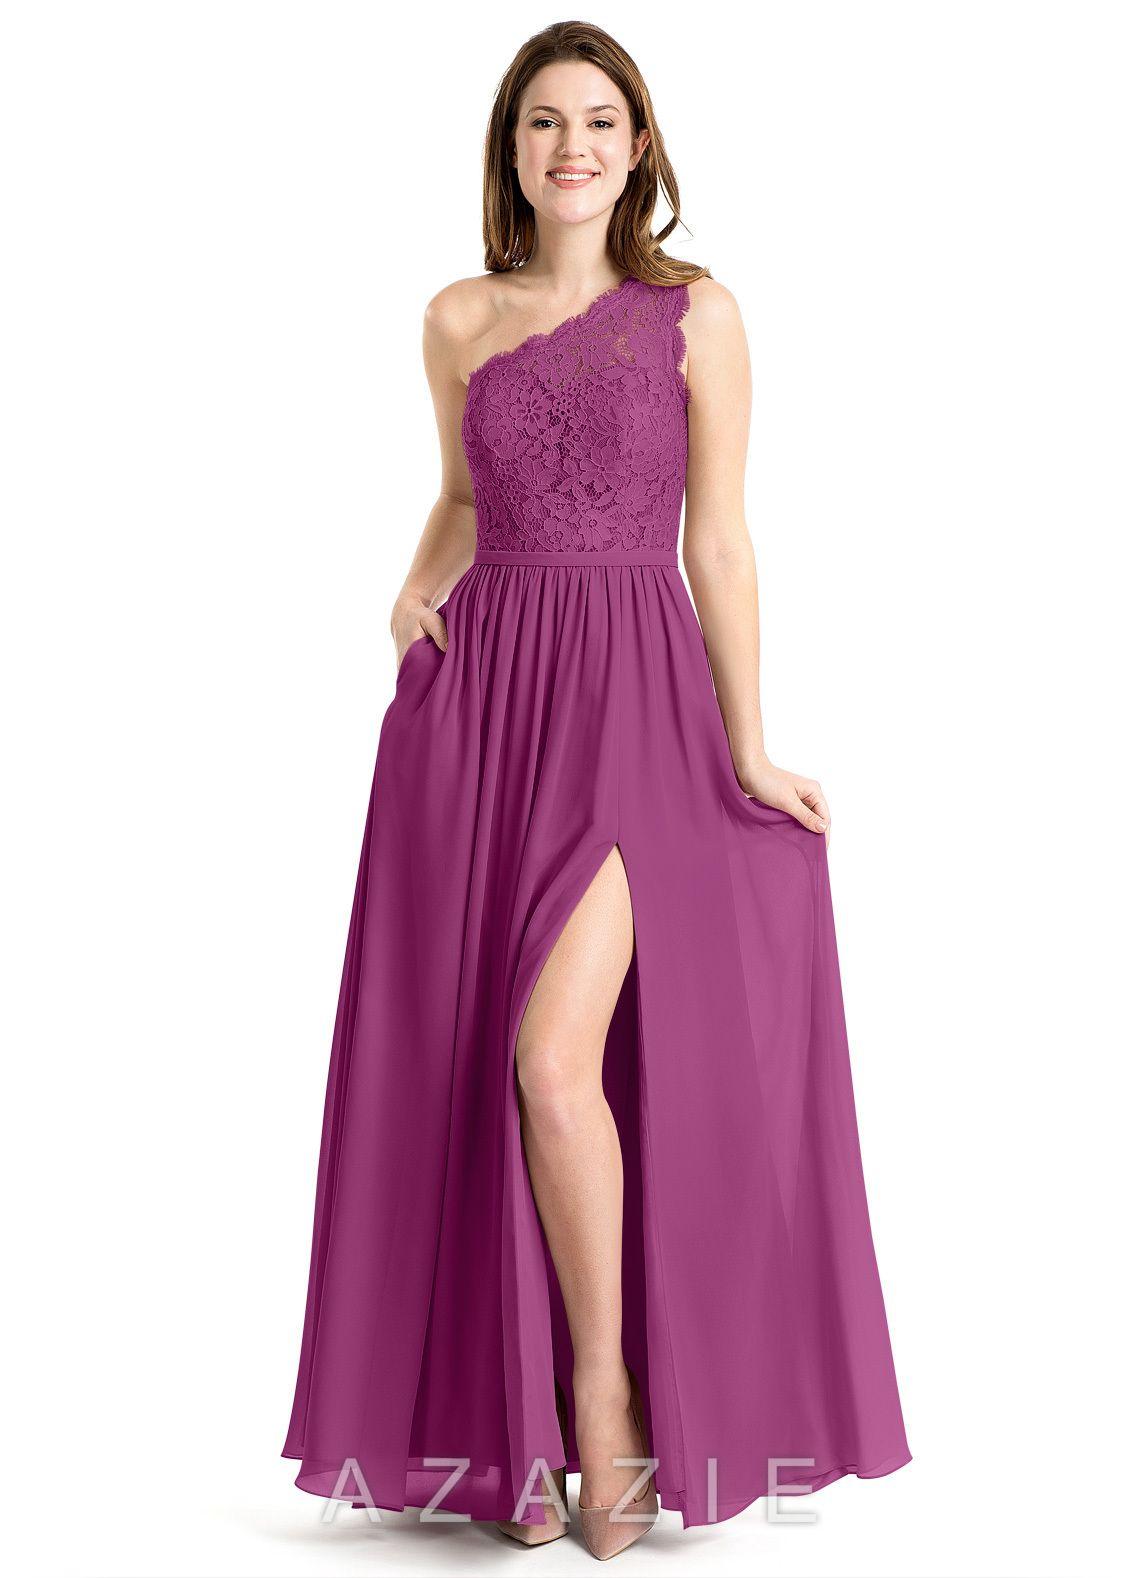 45eca13e88 Azazie Demi Bridesmaid Dress - Orchid